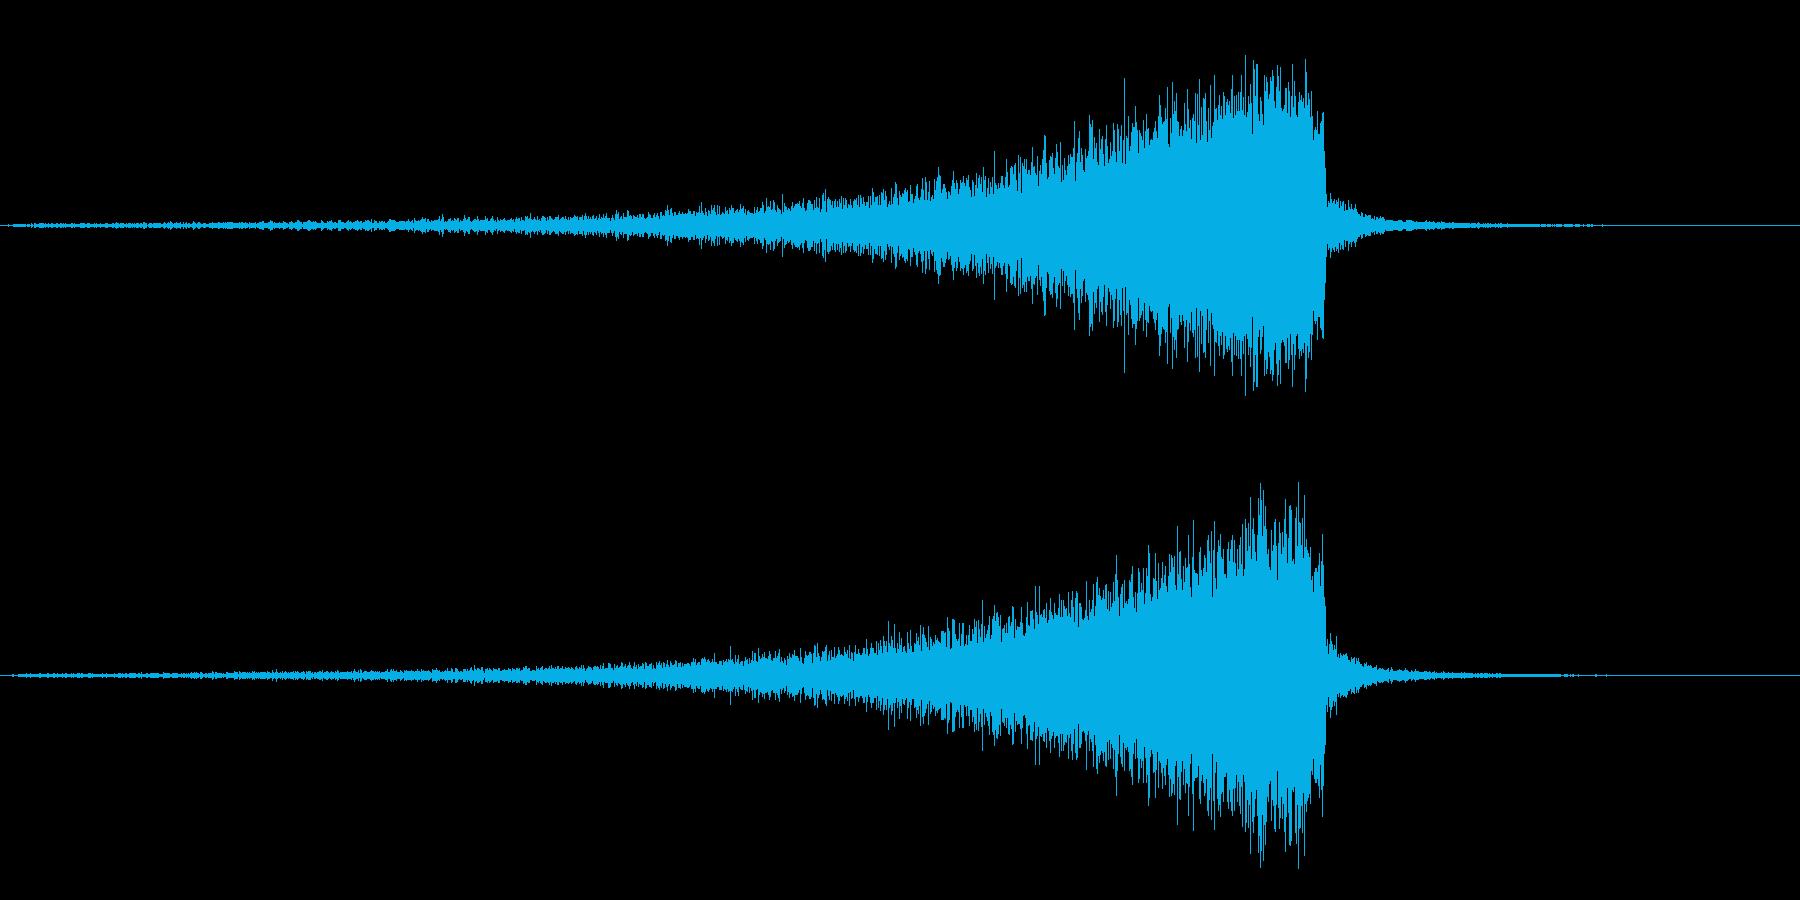 TV RADIO SFX6 ノイズ効果の再生済みの波形